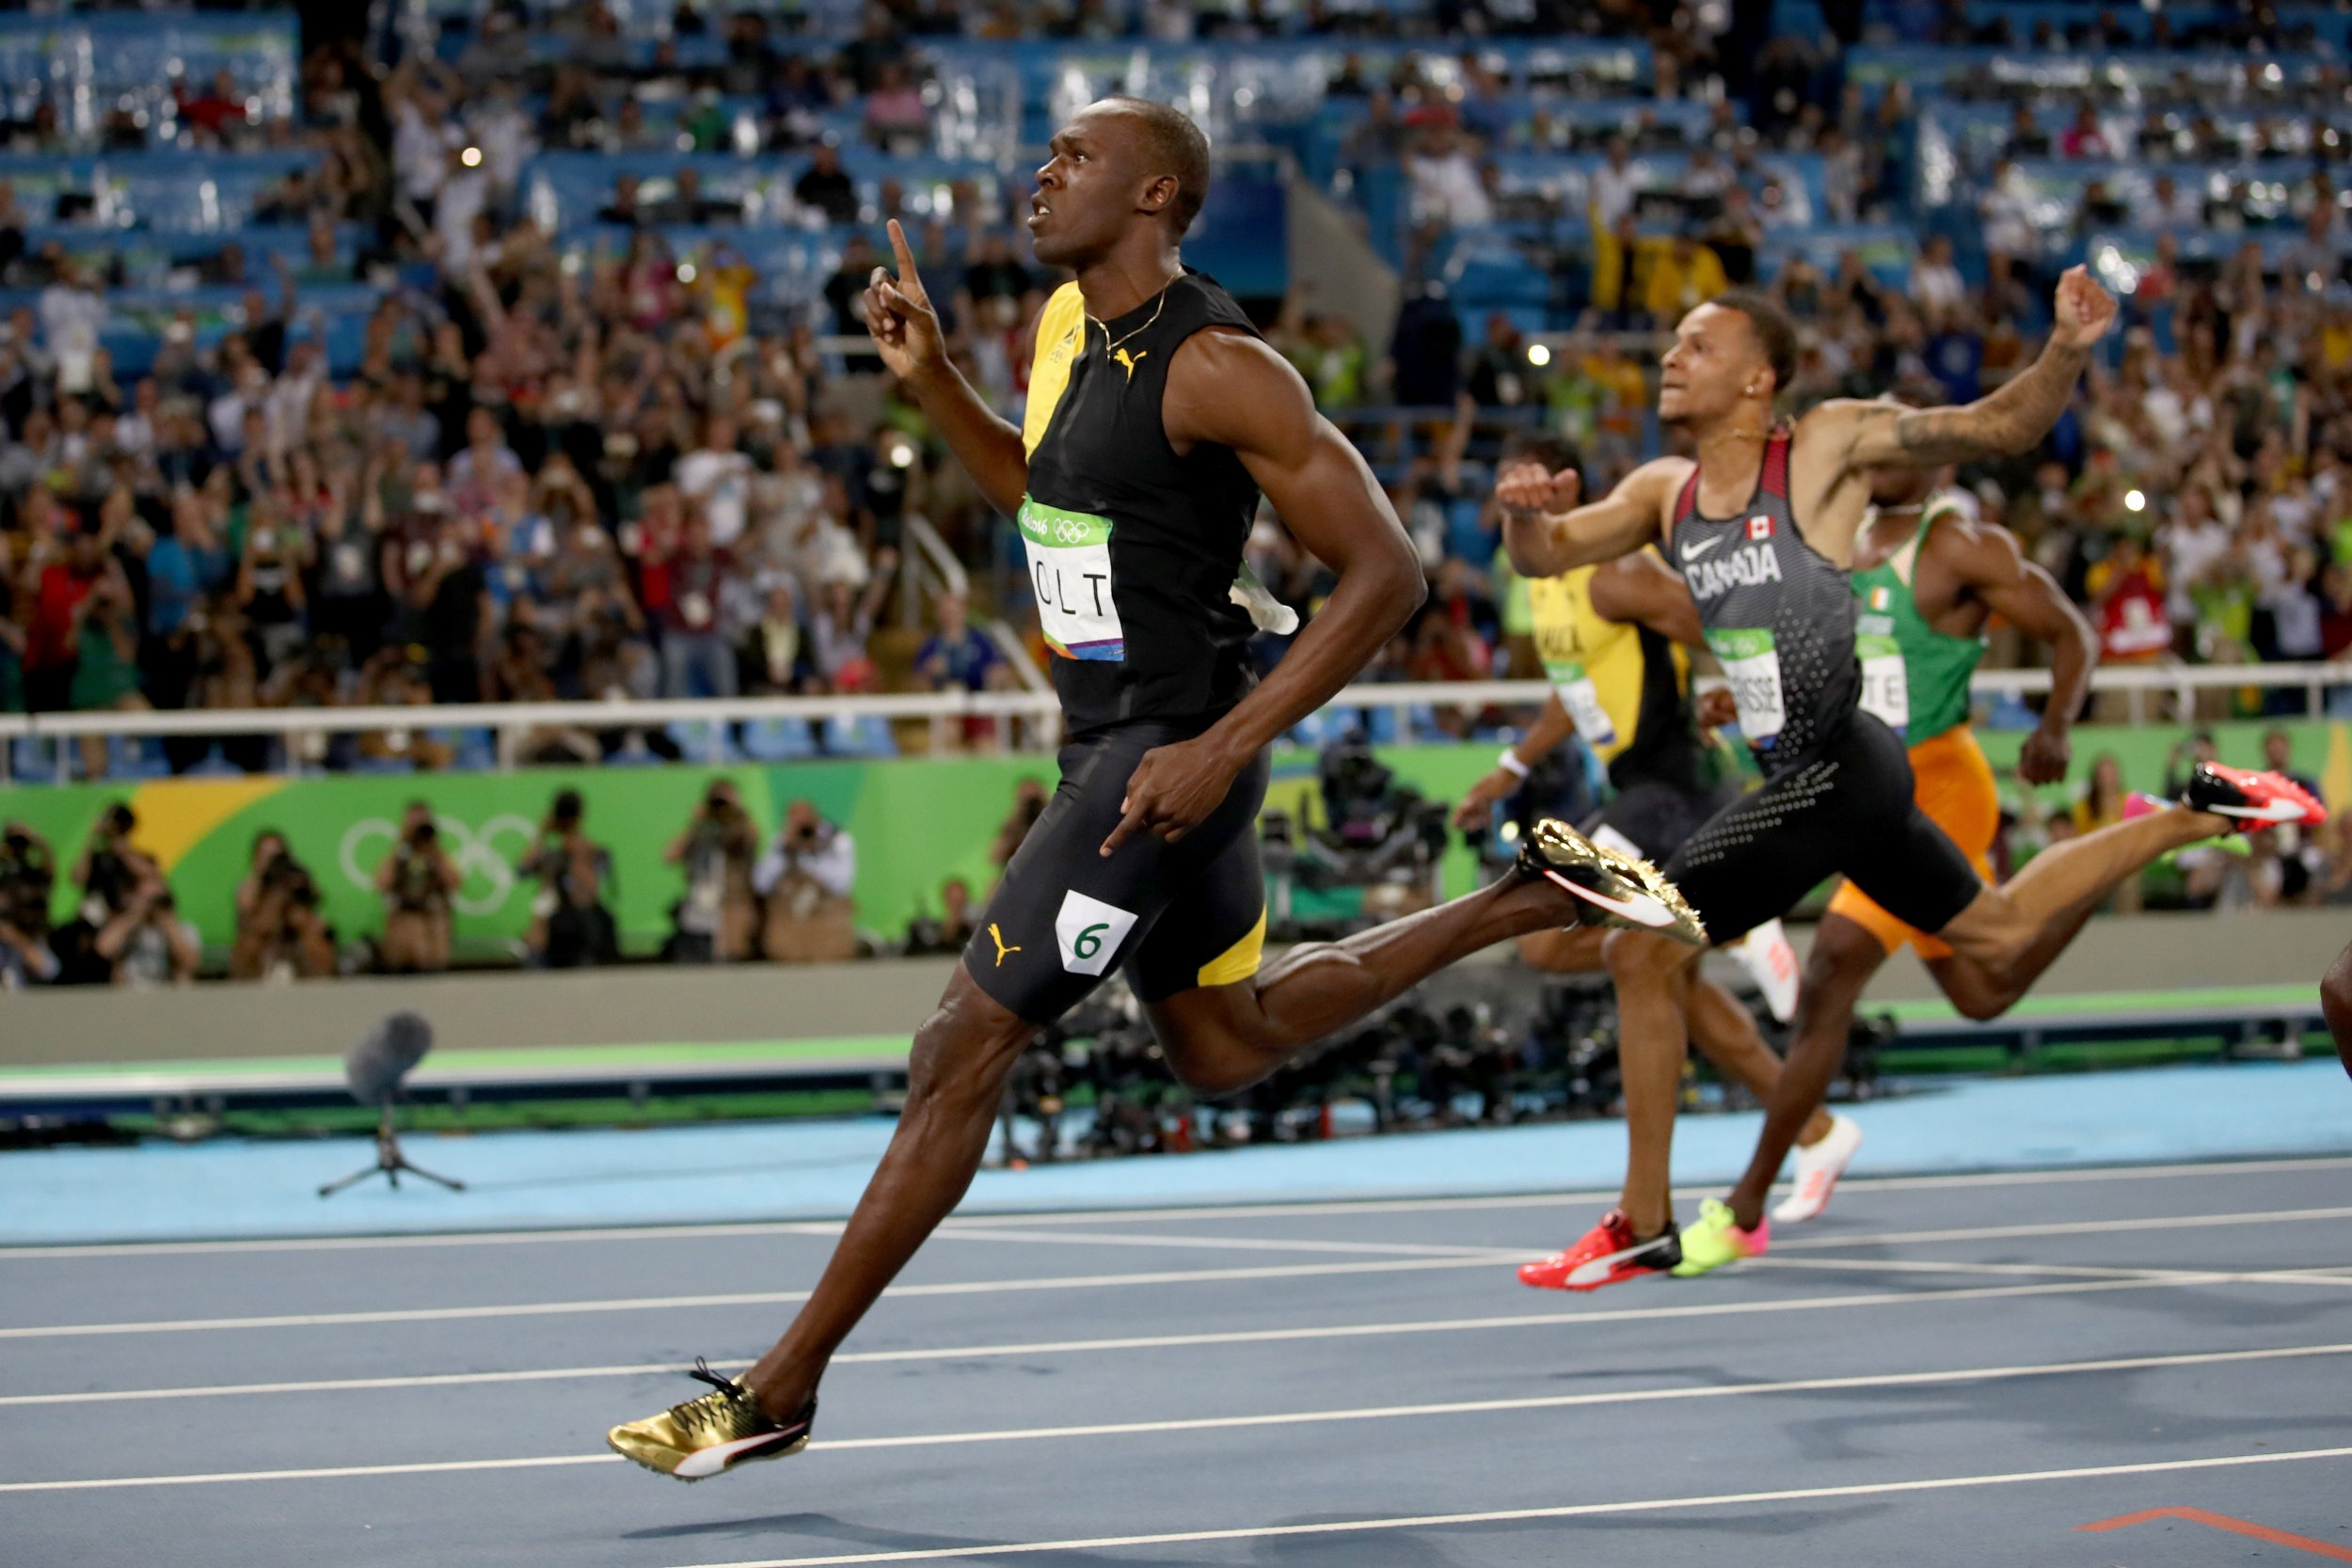 Watch Rio 2016 Highlights As Usain Bolt Wins Gold